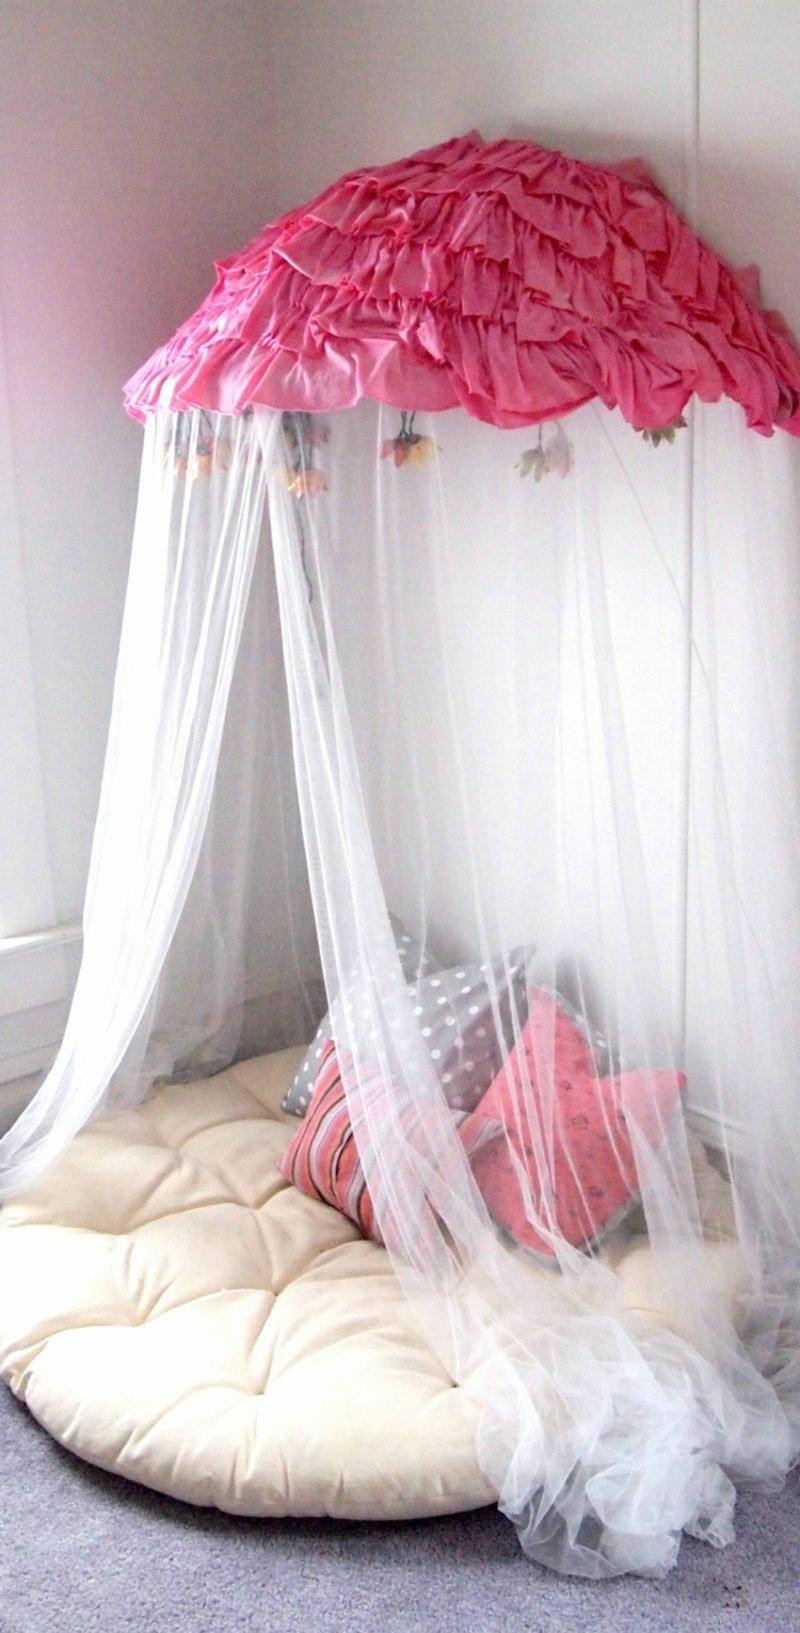 Kuschelecke Kinderzimmer romantisch Himmelsbett